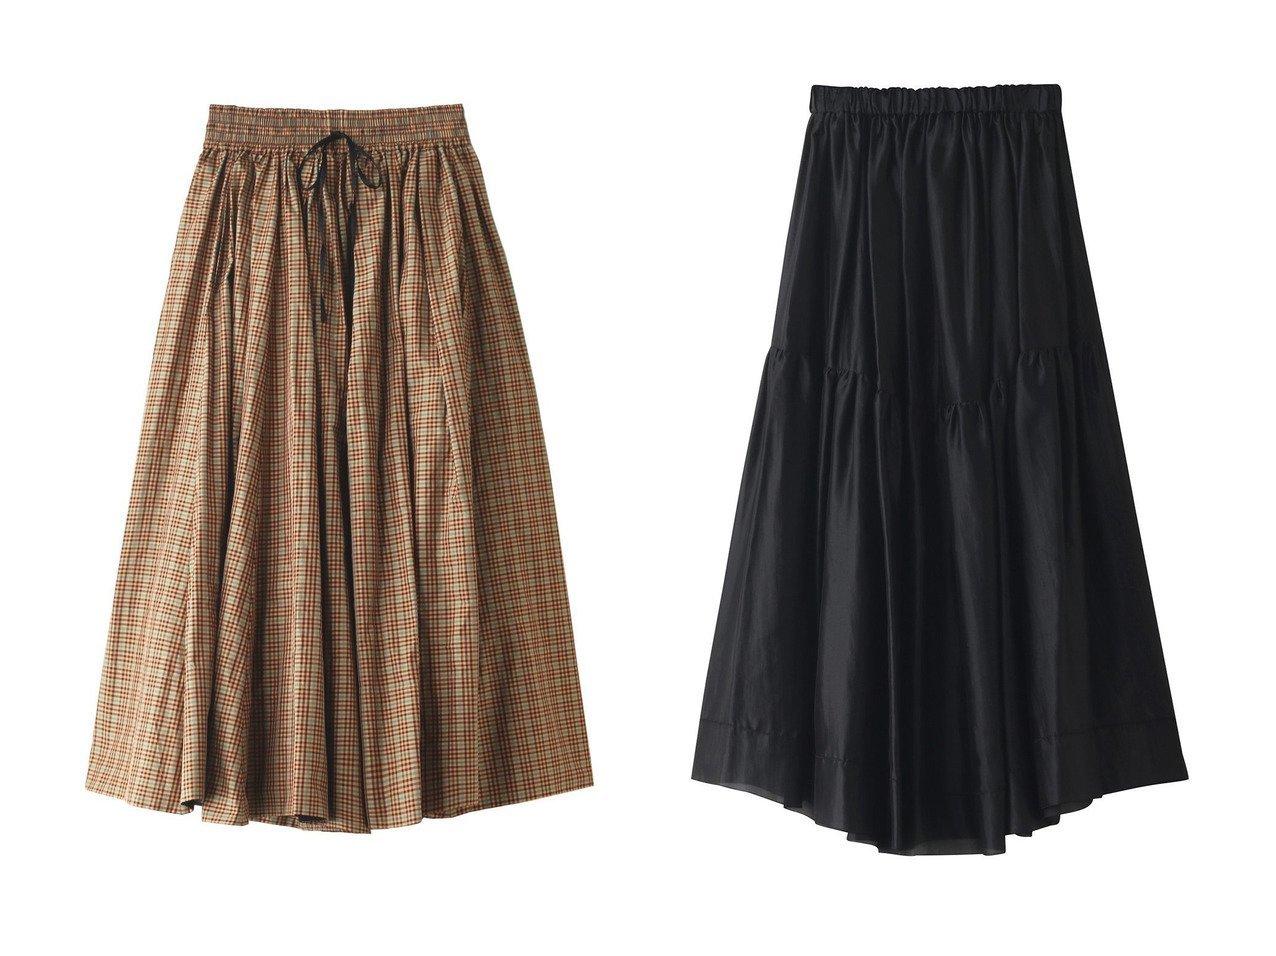 【BLAMINK/ブラミンク】のポリエステルチェックギャザースカート&シルクギャザーロングスカート 【スカート】おすすめ!人気、トレンド・レディースファッションの通販 おすすめで人気の流行・トレンド、ファッションの通販商品 インテリア・家具・メンズファッション・キッズファッション・レディースファッション・服の通販 founy(ファニー) https://founy.com/ ファッション Fashion レディースファッション WOMEN スカート Skirt ロングスカート Long Skirt チェック フレア ロング 秋 Autumn/Fall エアリー シアー シルク パーティ フェミニン |ID:crp329100000072094